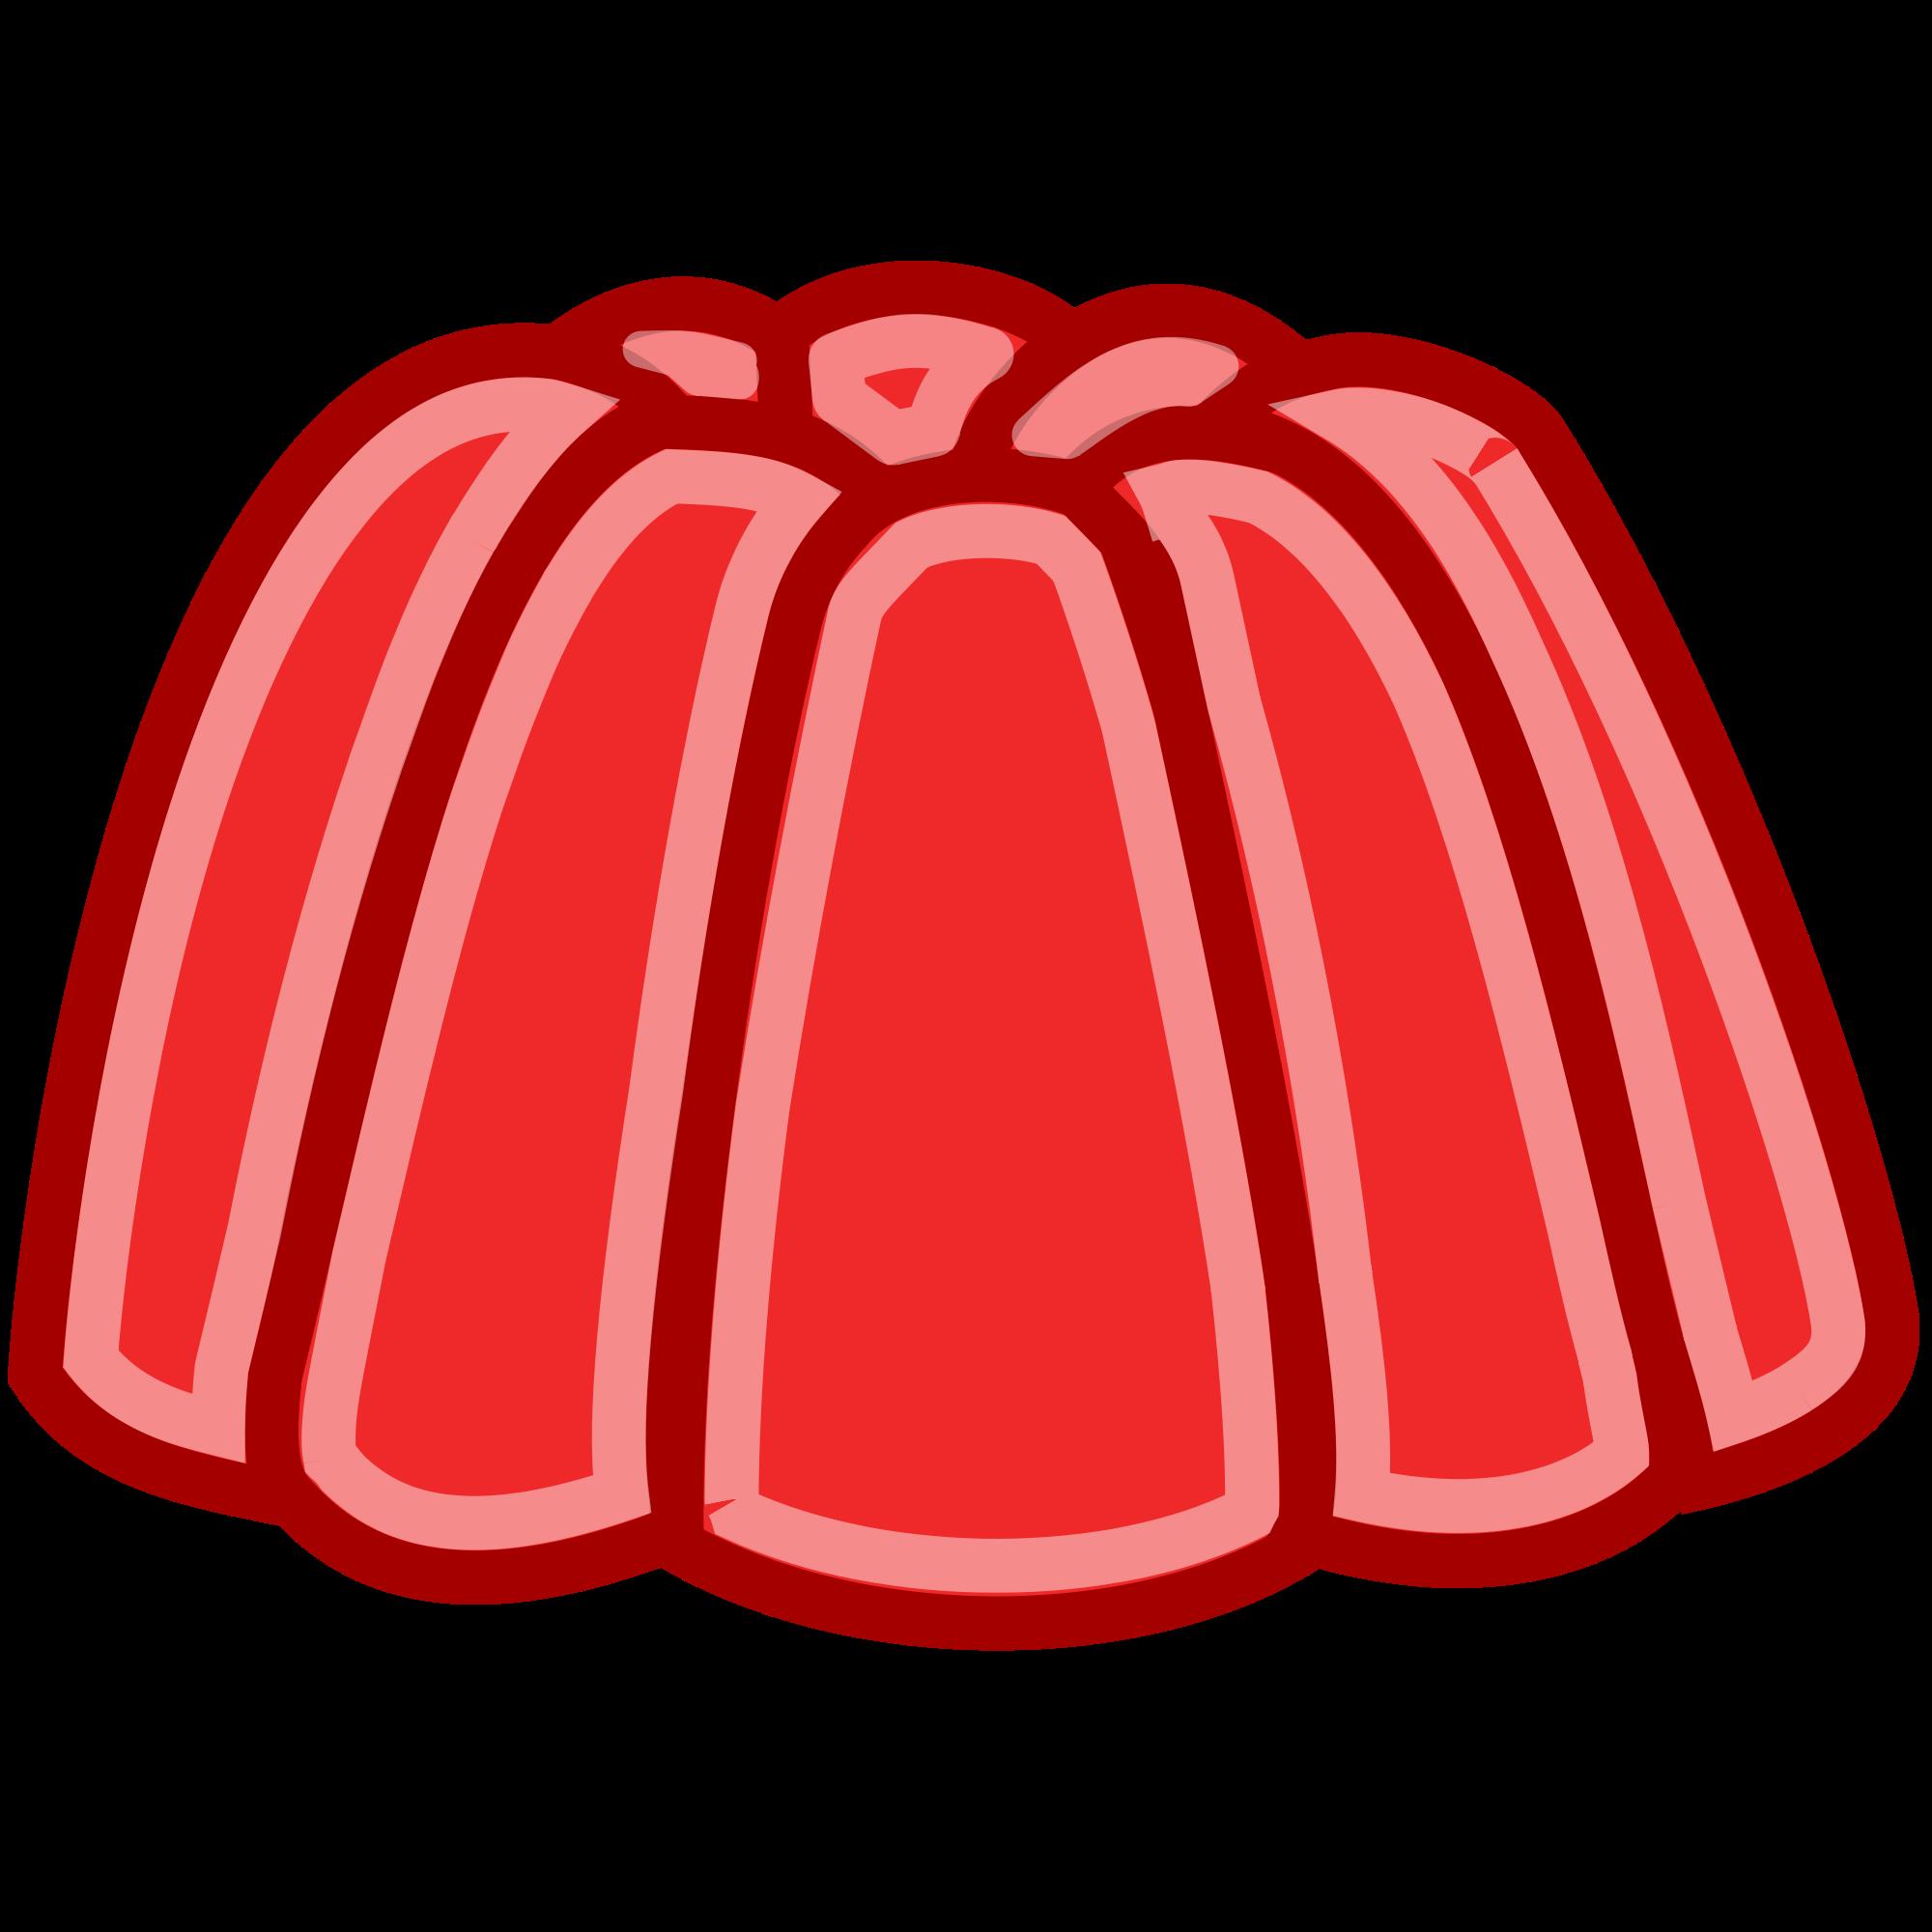 Jelly clipart jelly jar. File food svg wikimedia